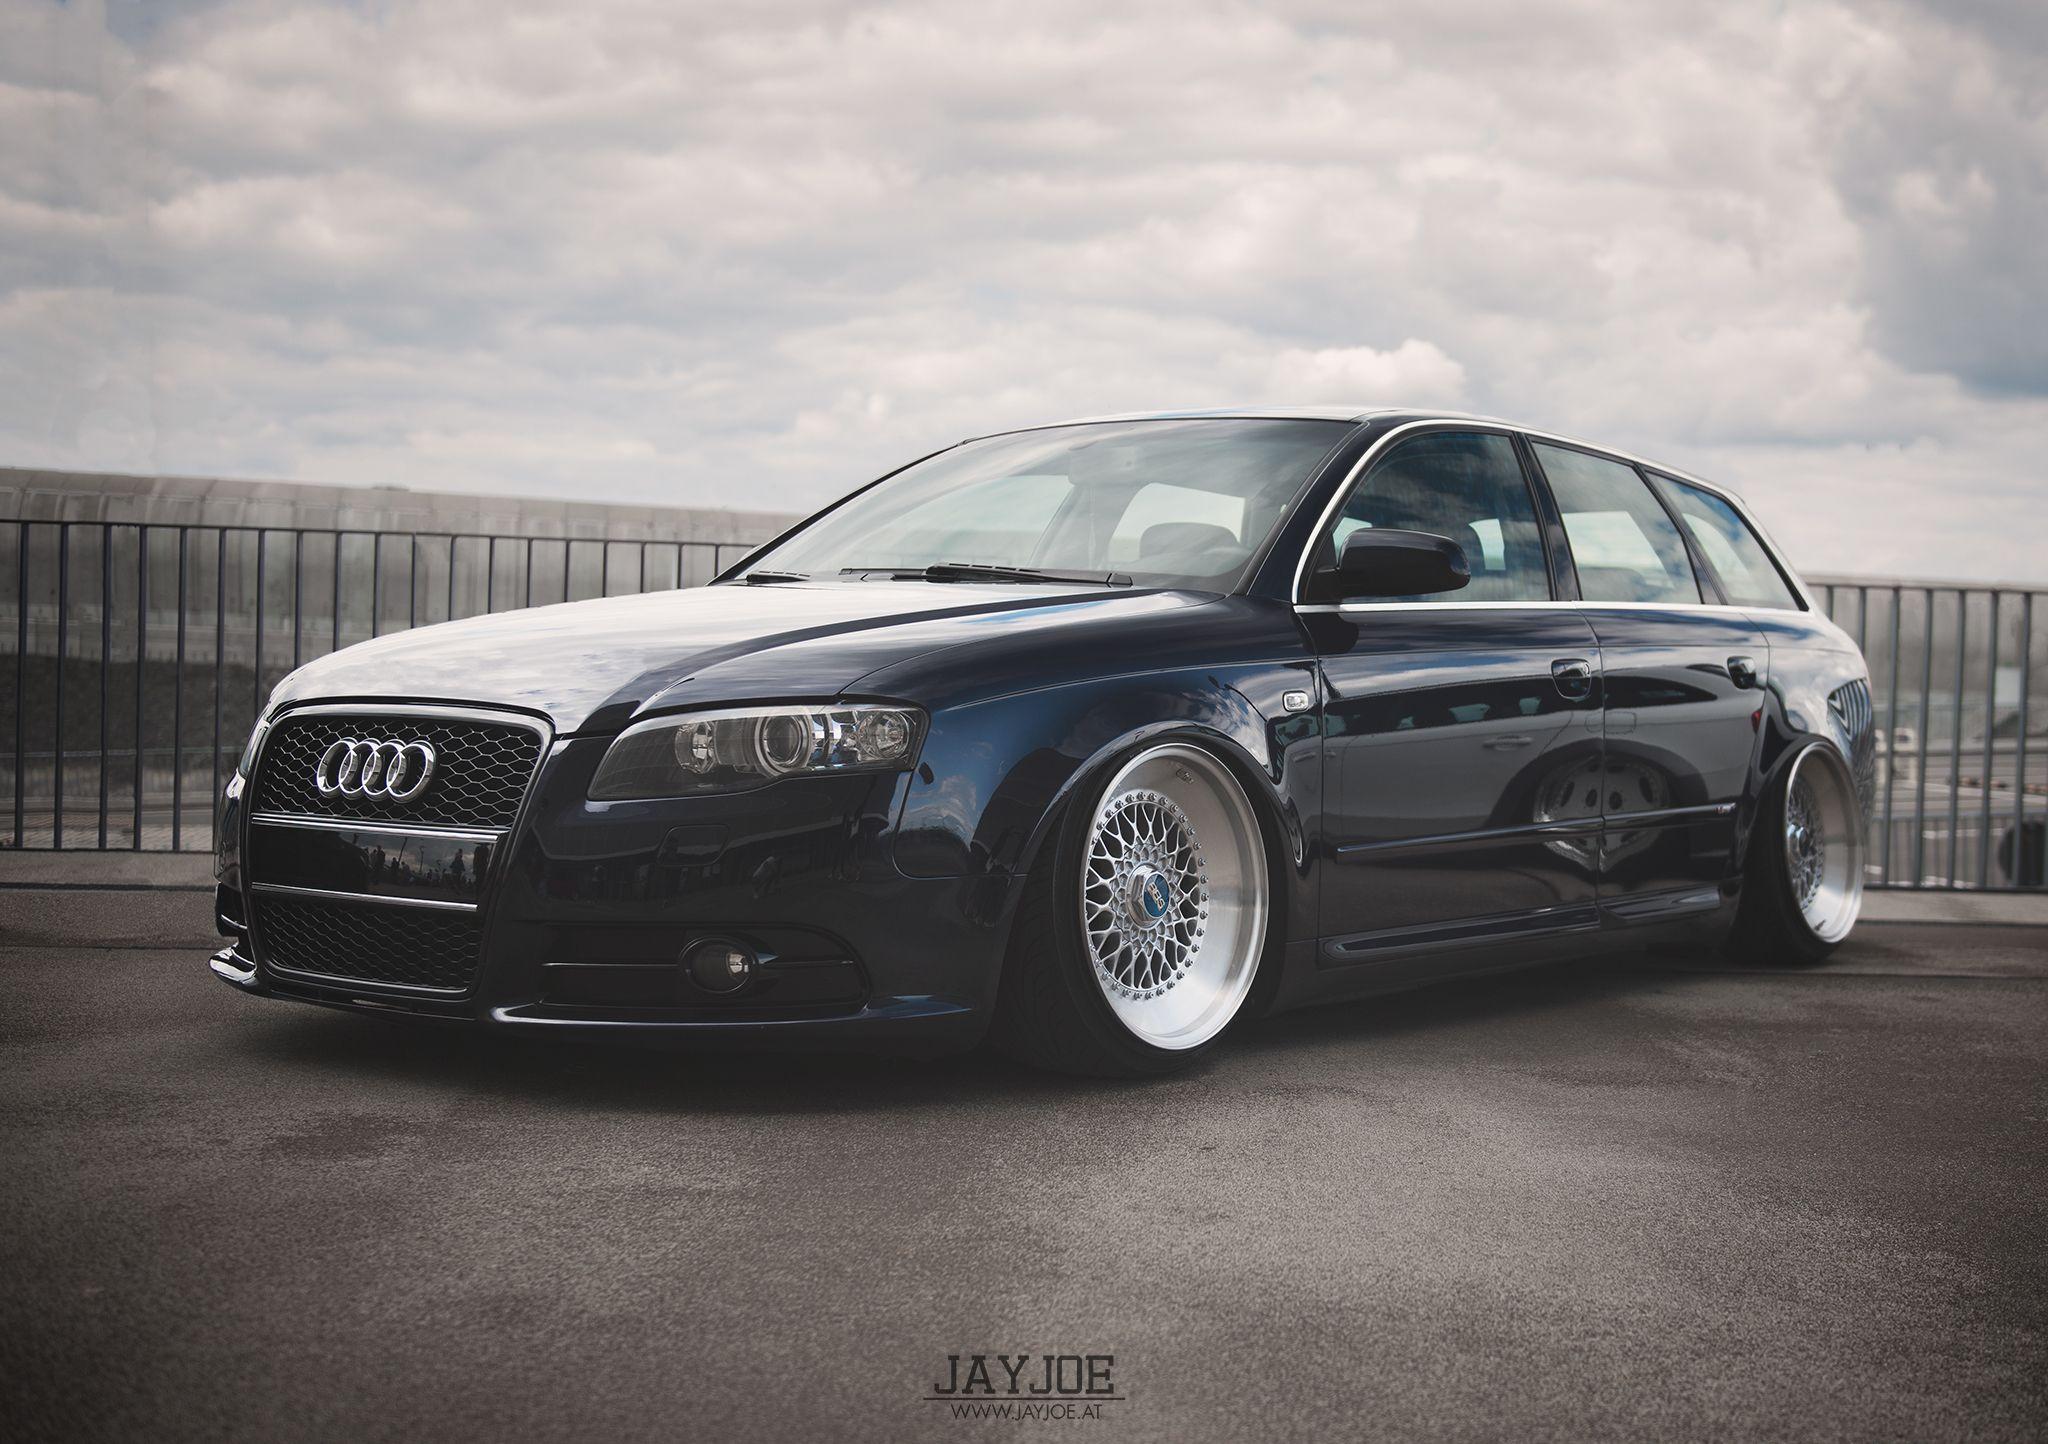 Raceism Event 2016 Audi A4 Avant B7 Www Jayjoe At Shop Http Jayjoe Bigcartel Com アウディ かっこいい